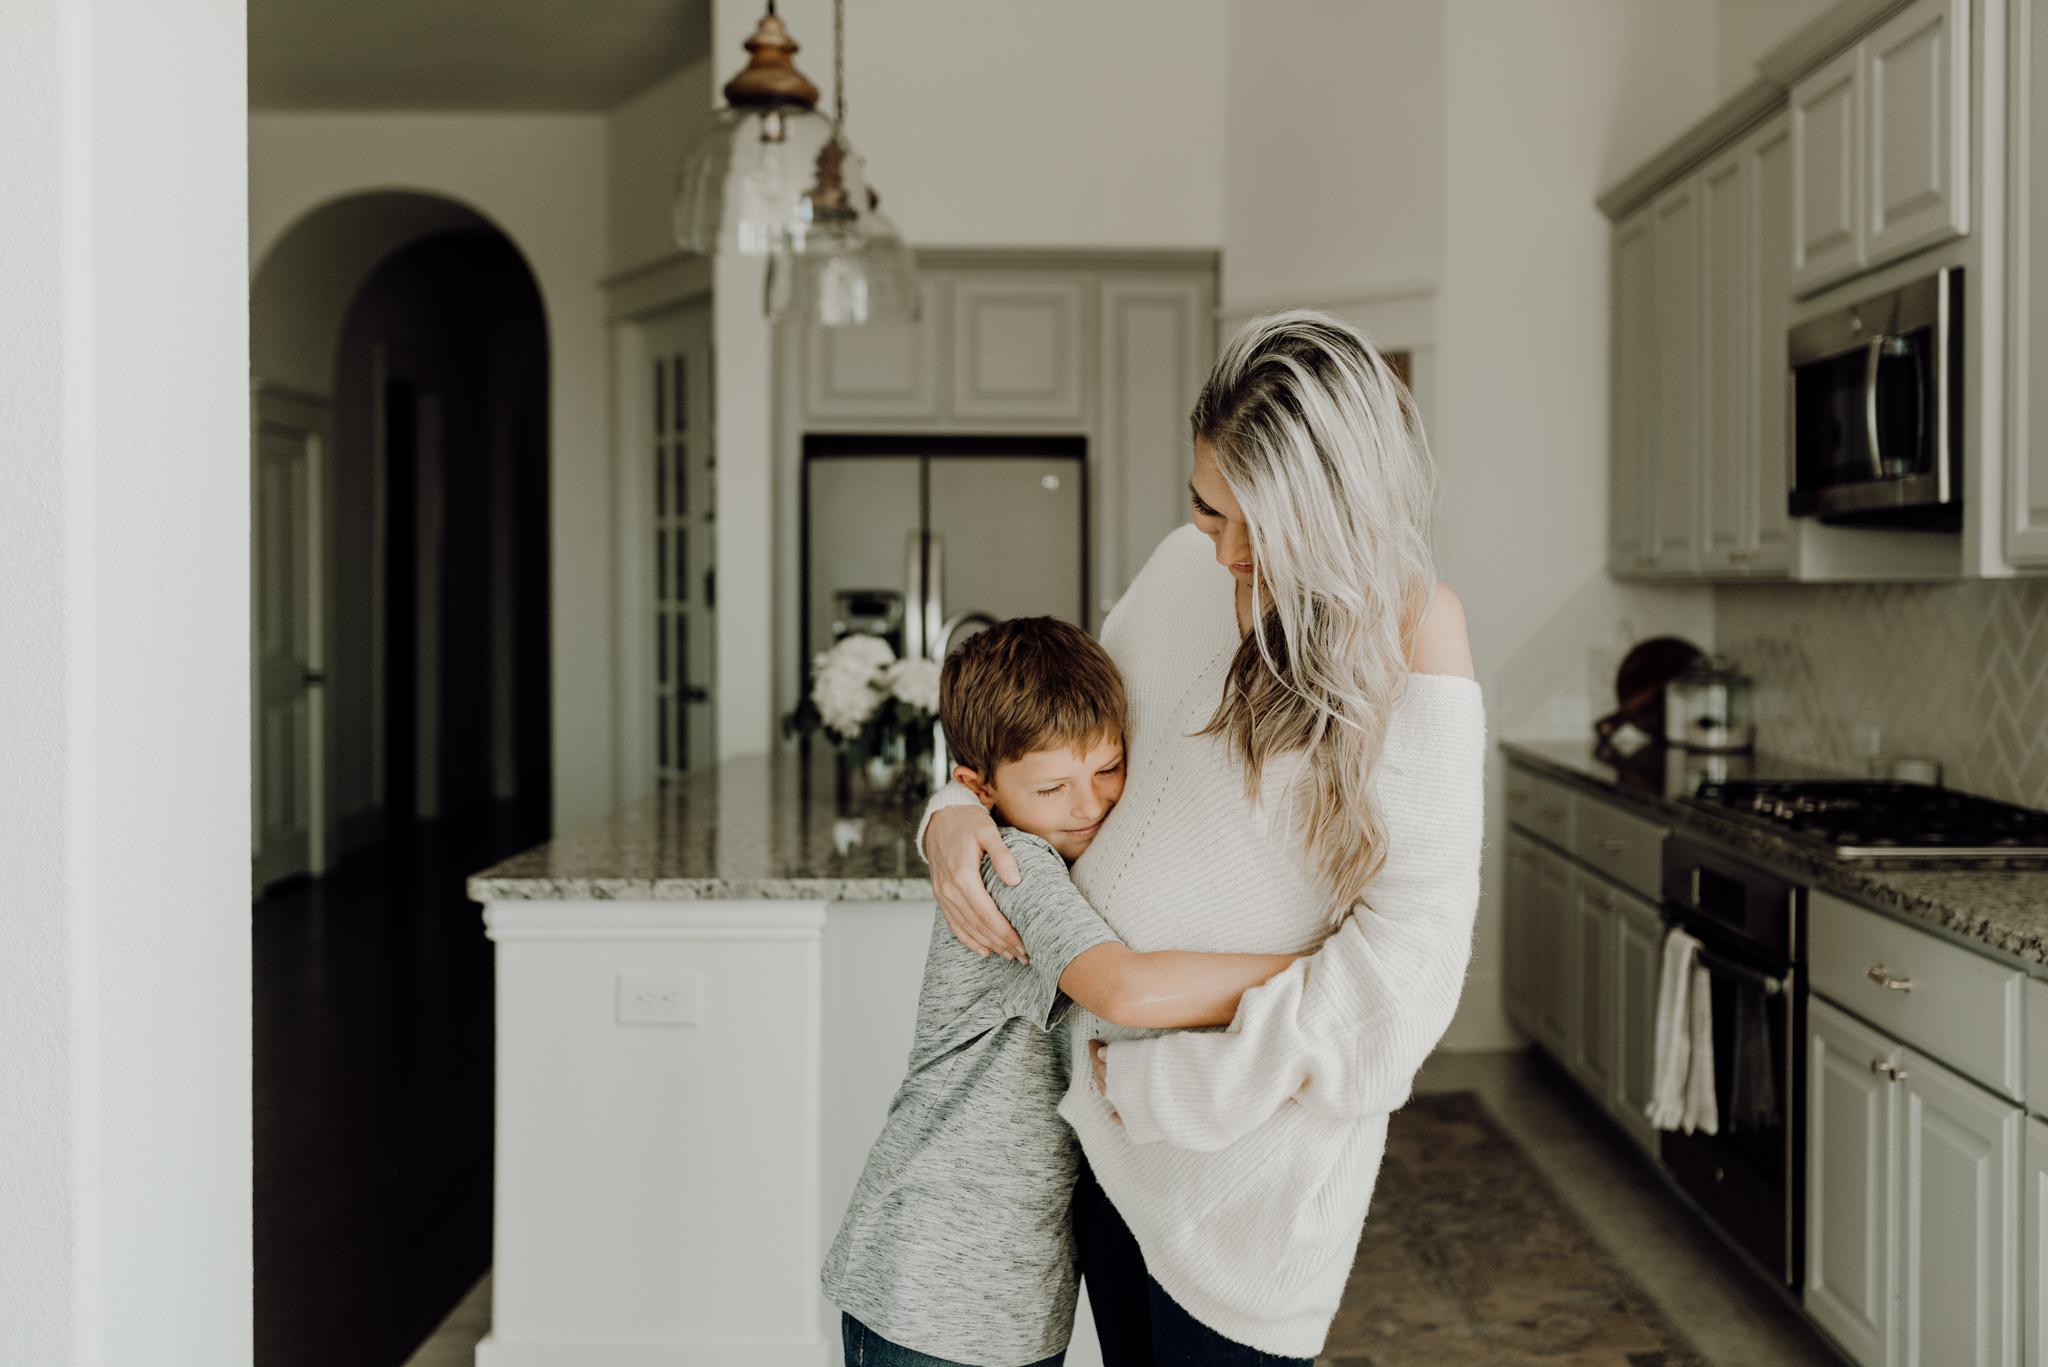 houston-wedding-photographer-in-home-maternity-session-puppies- Houston Wedding Photographer -Kristen Giles Photography-29.jpg